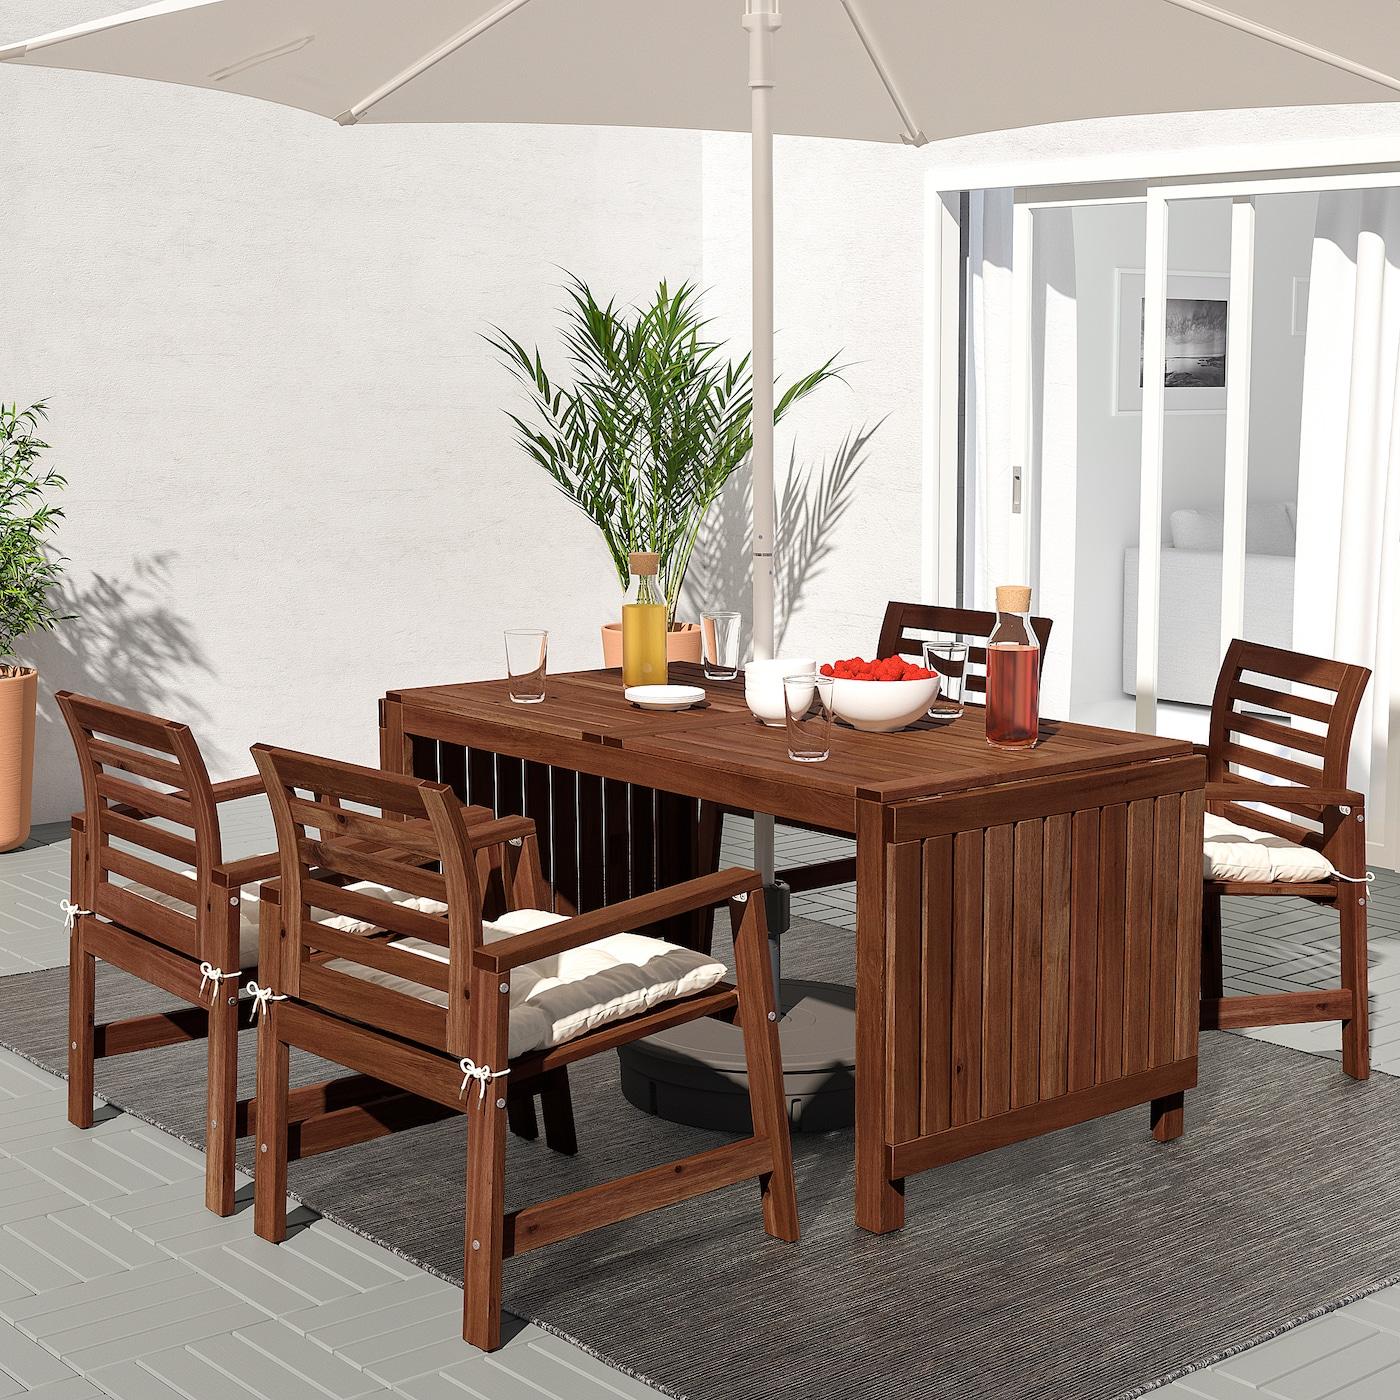 ÄPPLARÖ Chaise à accoudoirs, extérieur, teinté brun